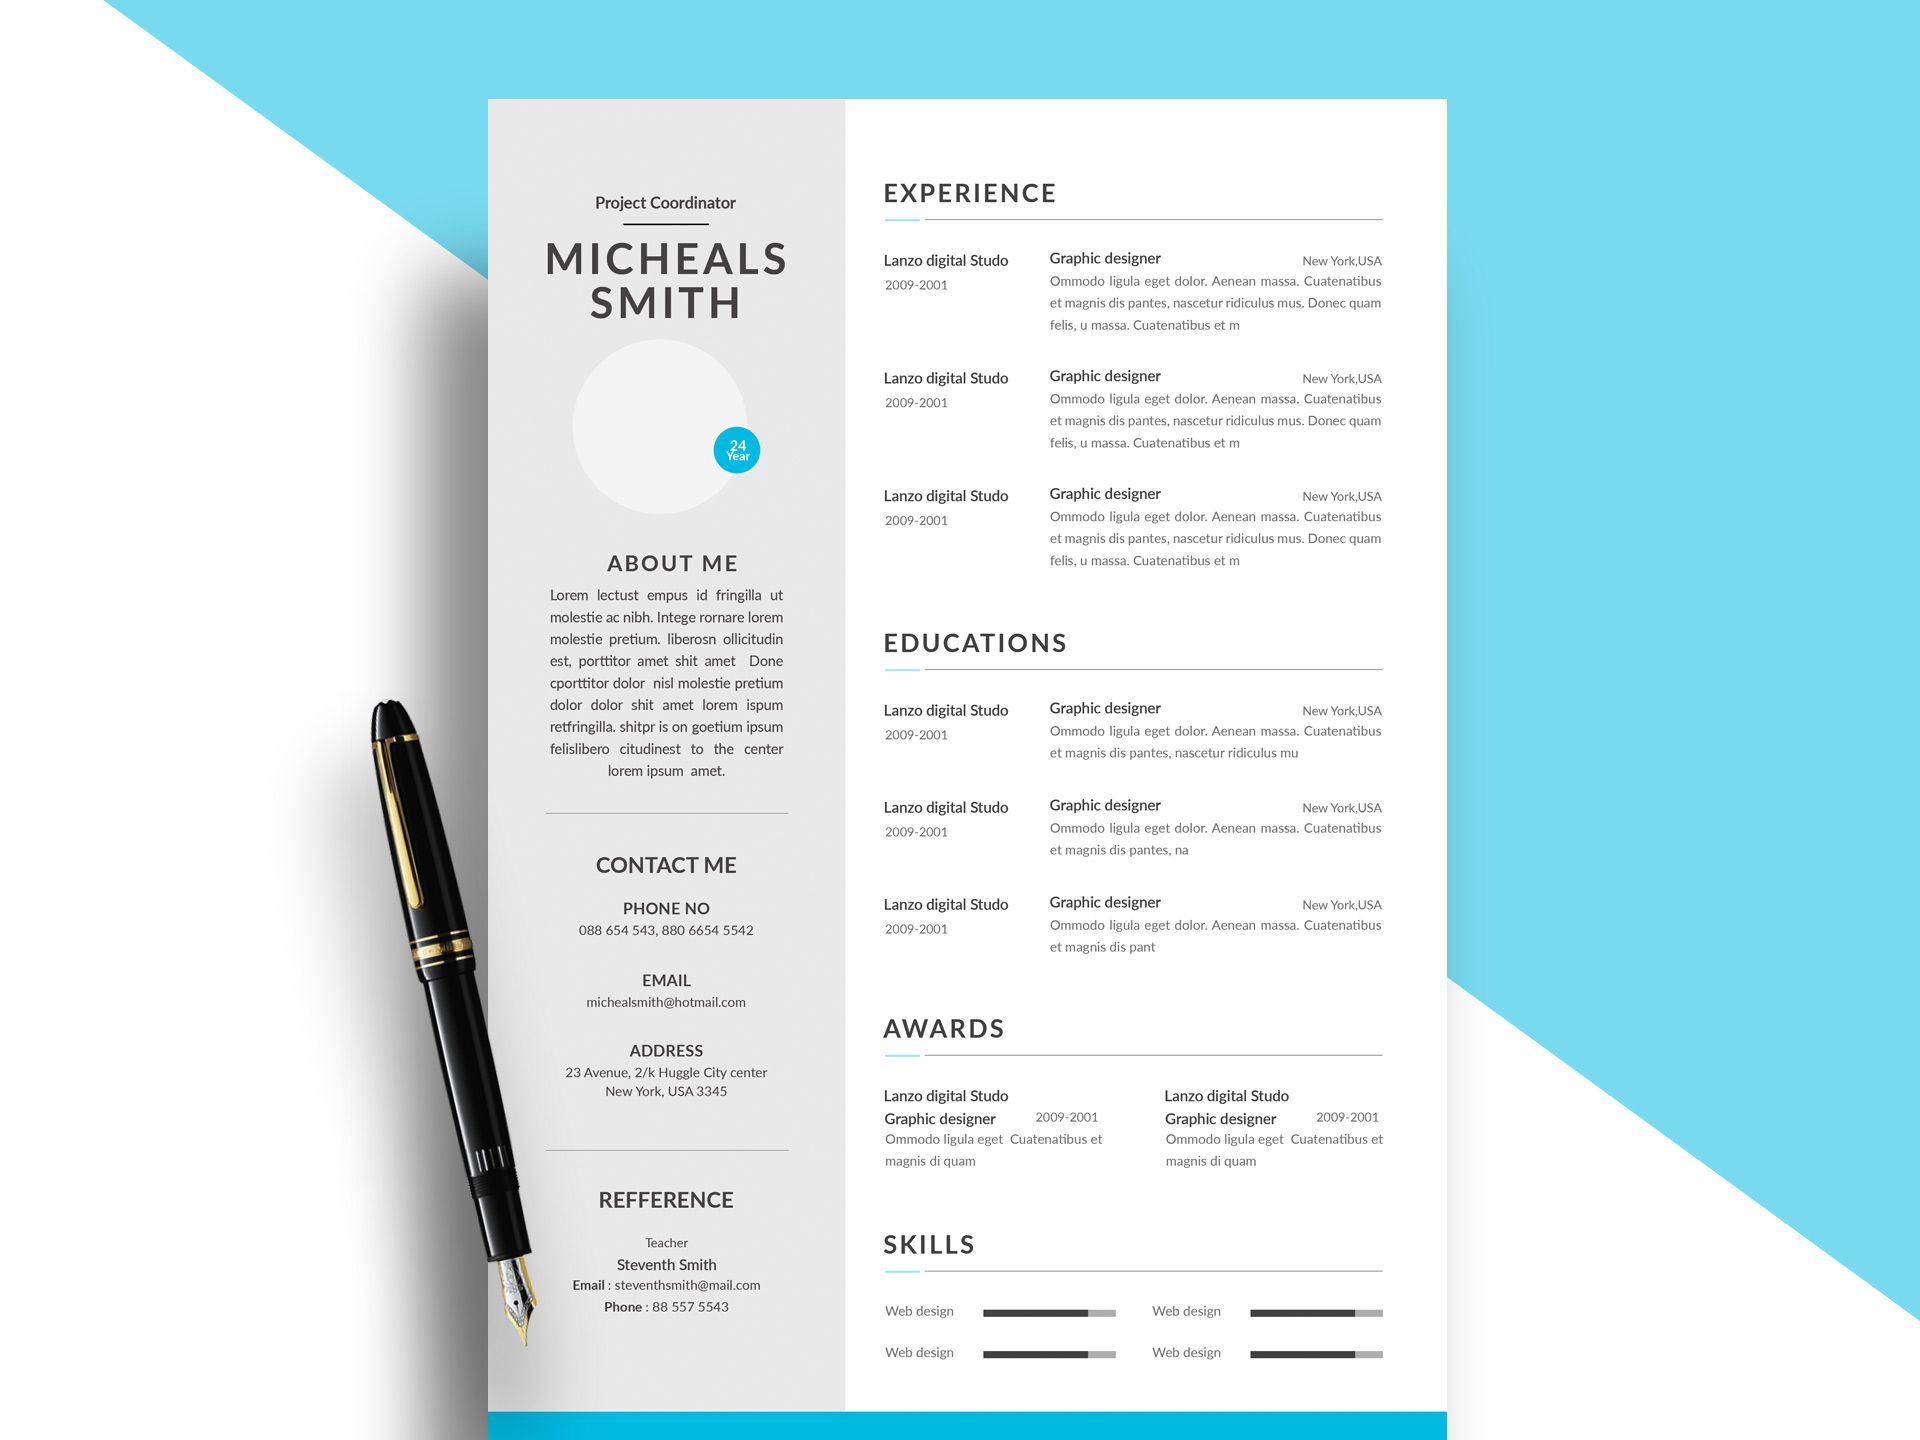 004 Top Psd Resume Template Free Download High Def  Graphic Designer Creative CvFull